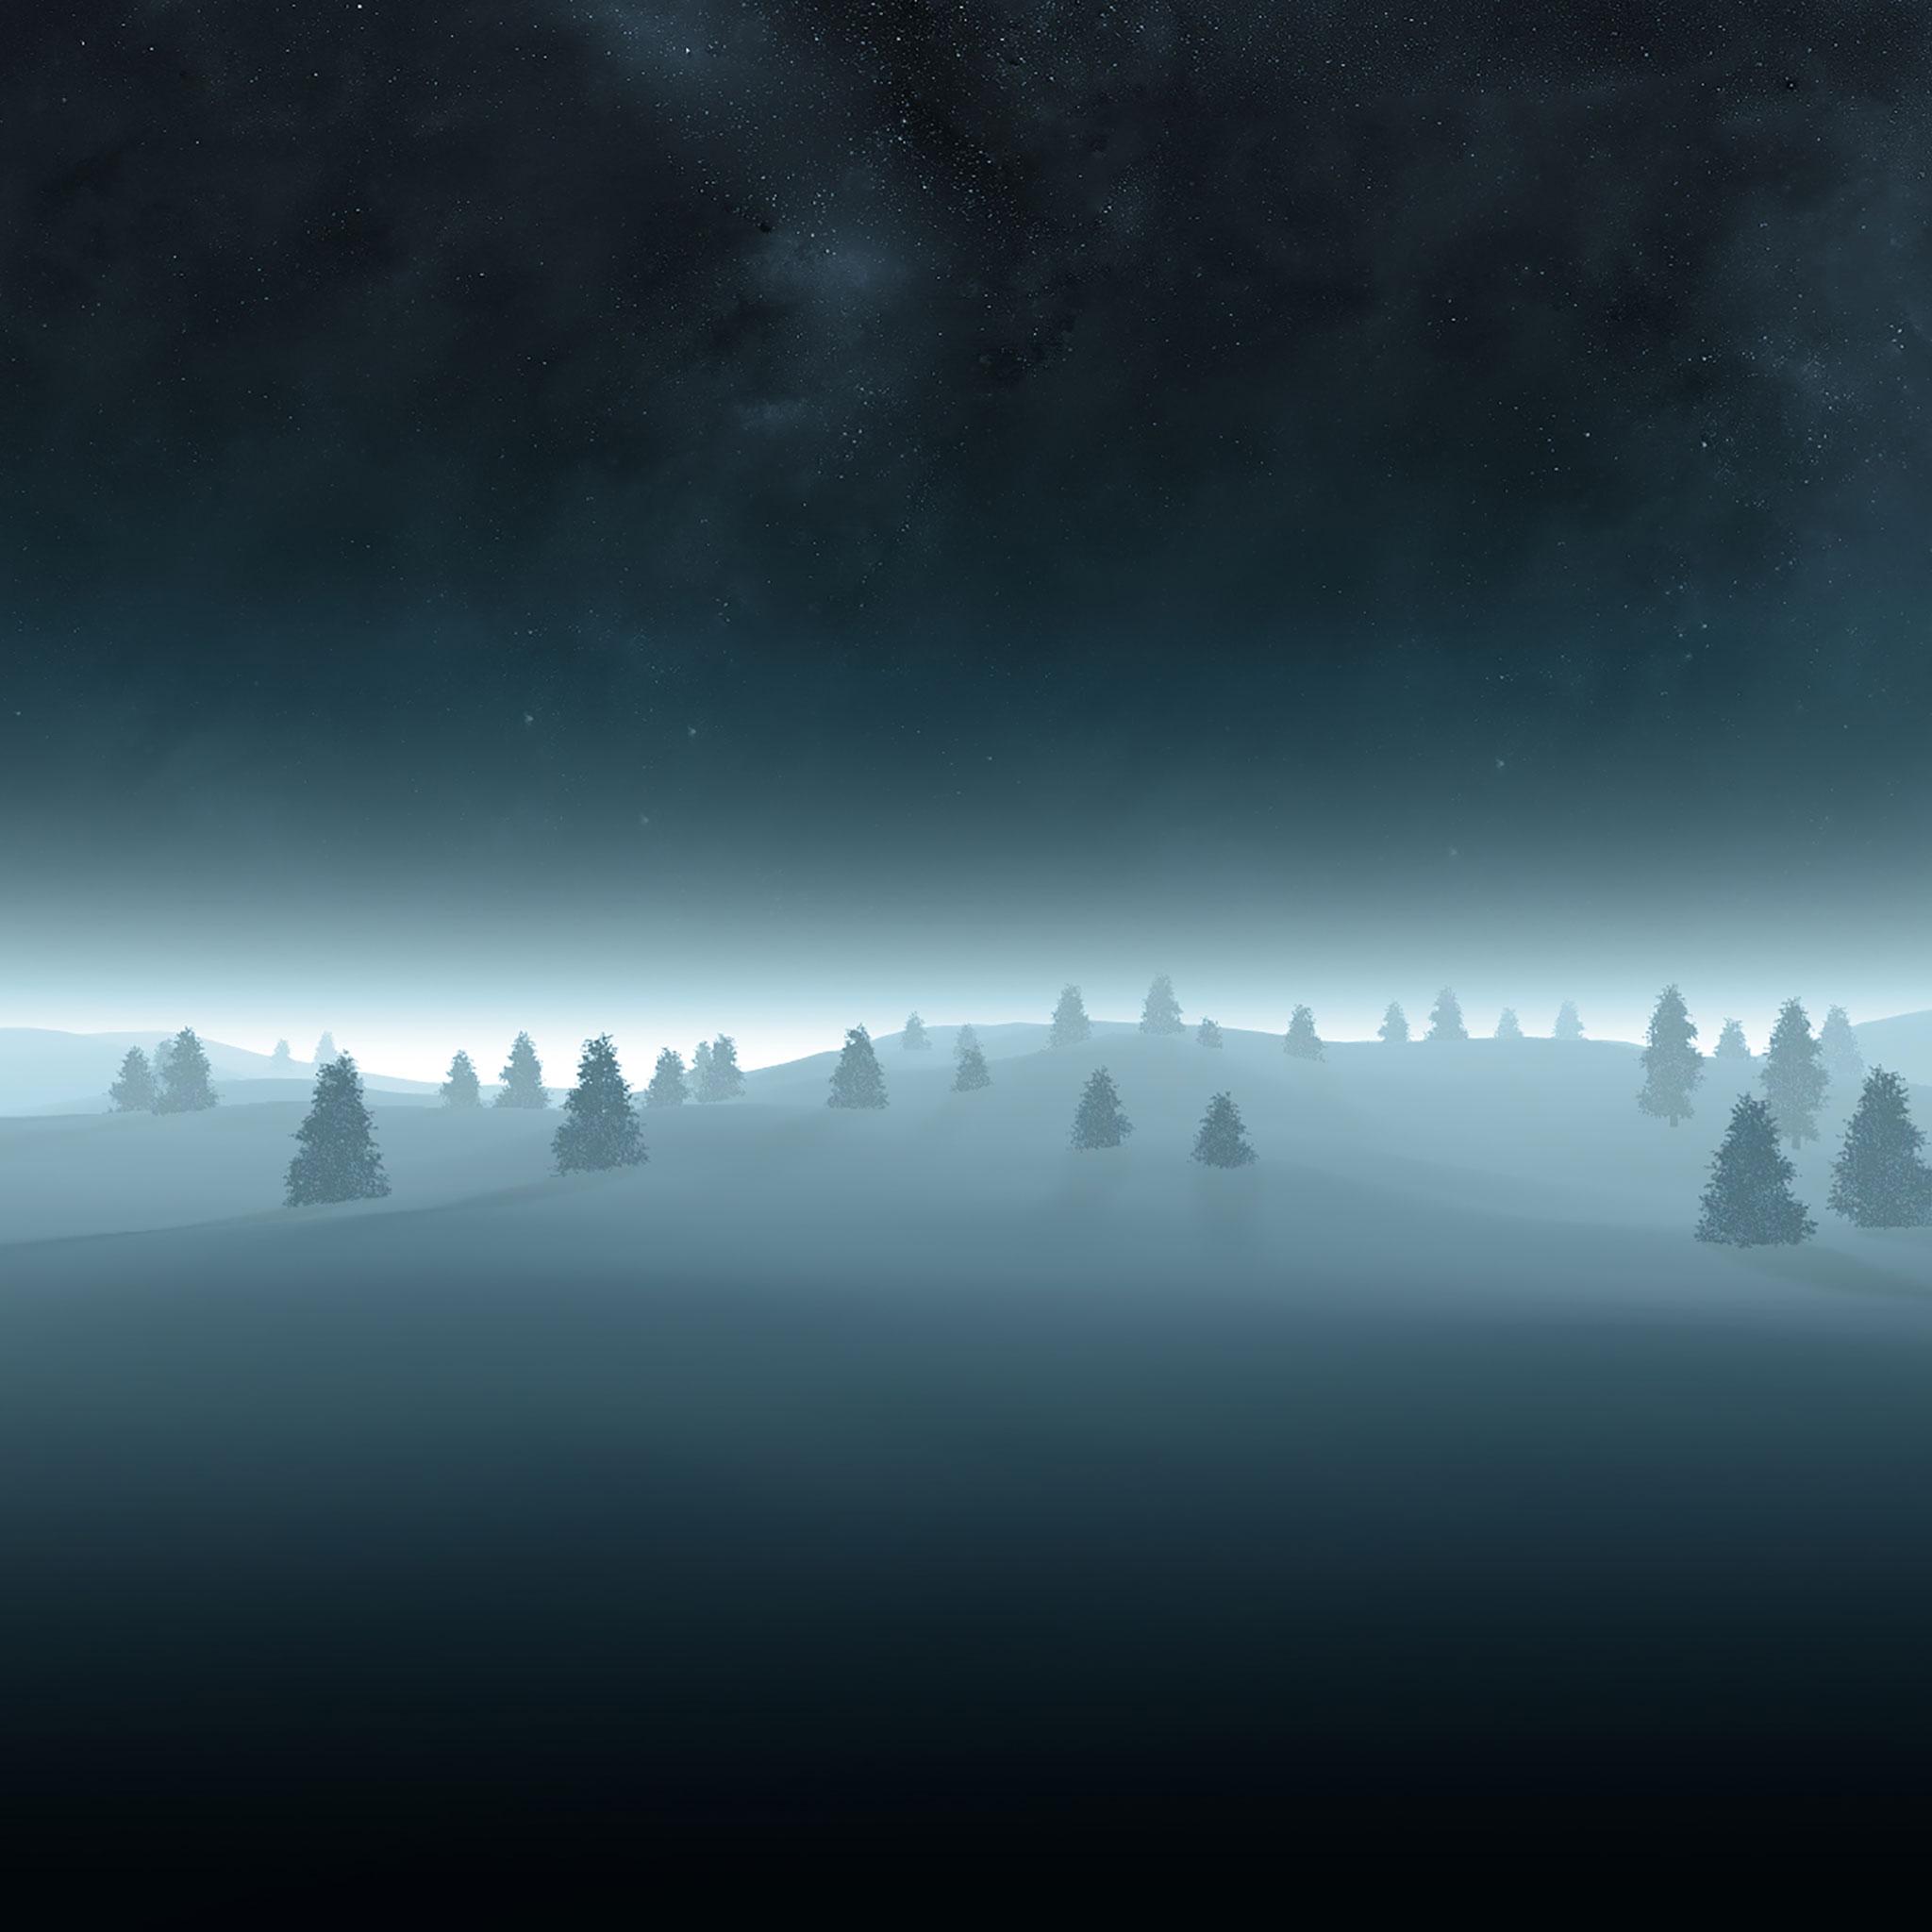 Snow Live Wallpaper: Live Weather Wallpapers For Desktop